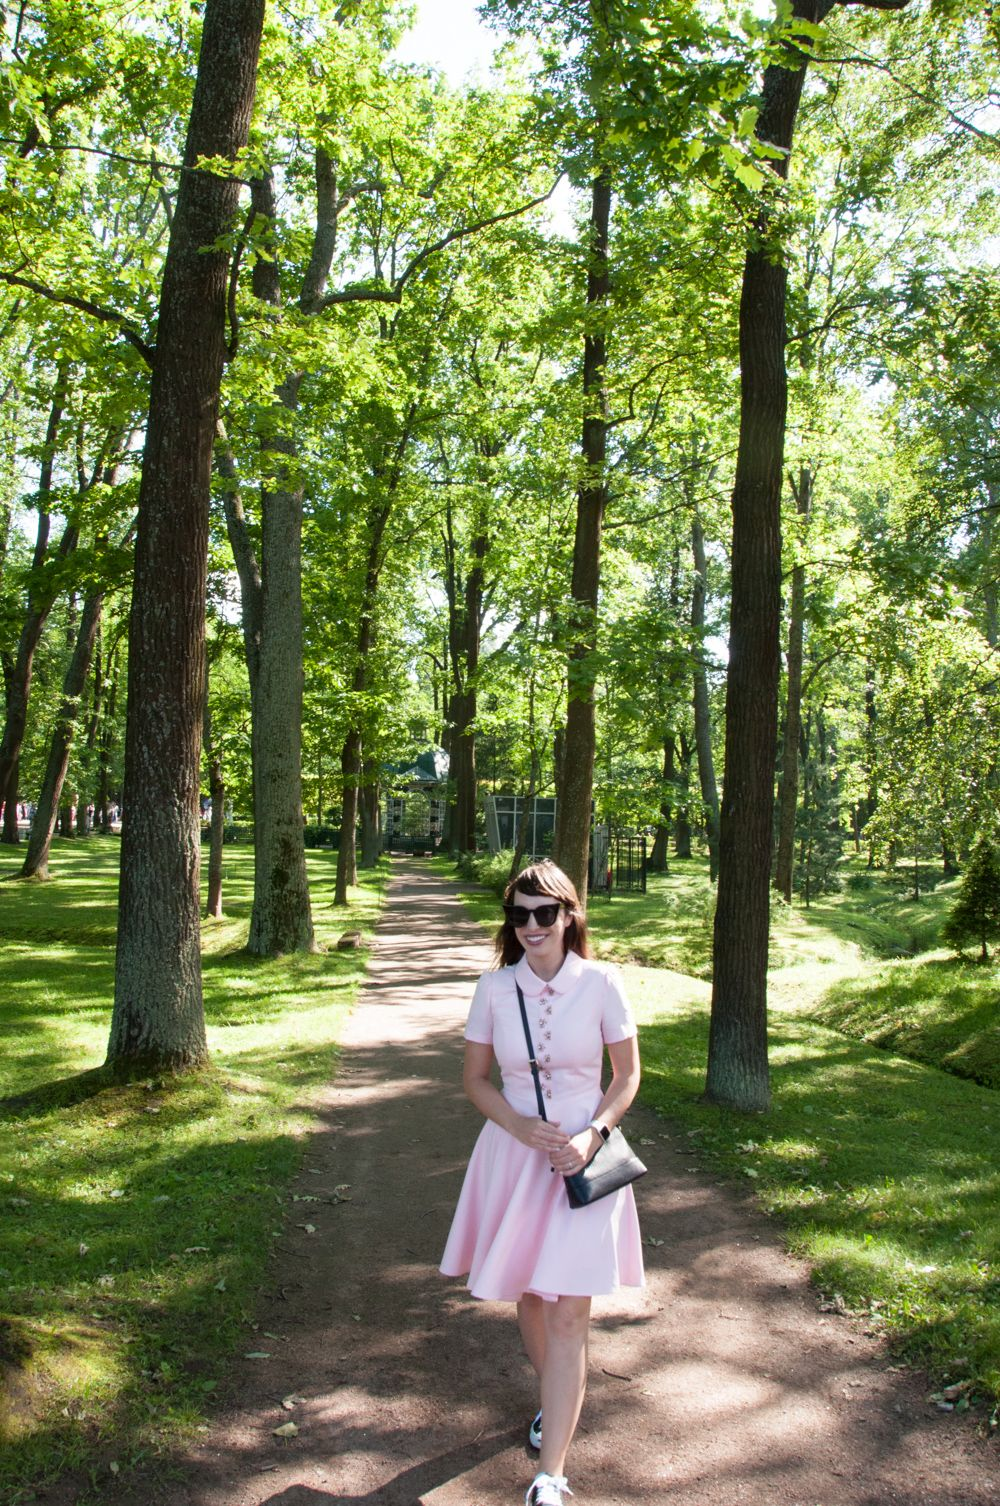 Saint Petersburg- Peterhof Palace